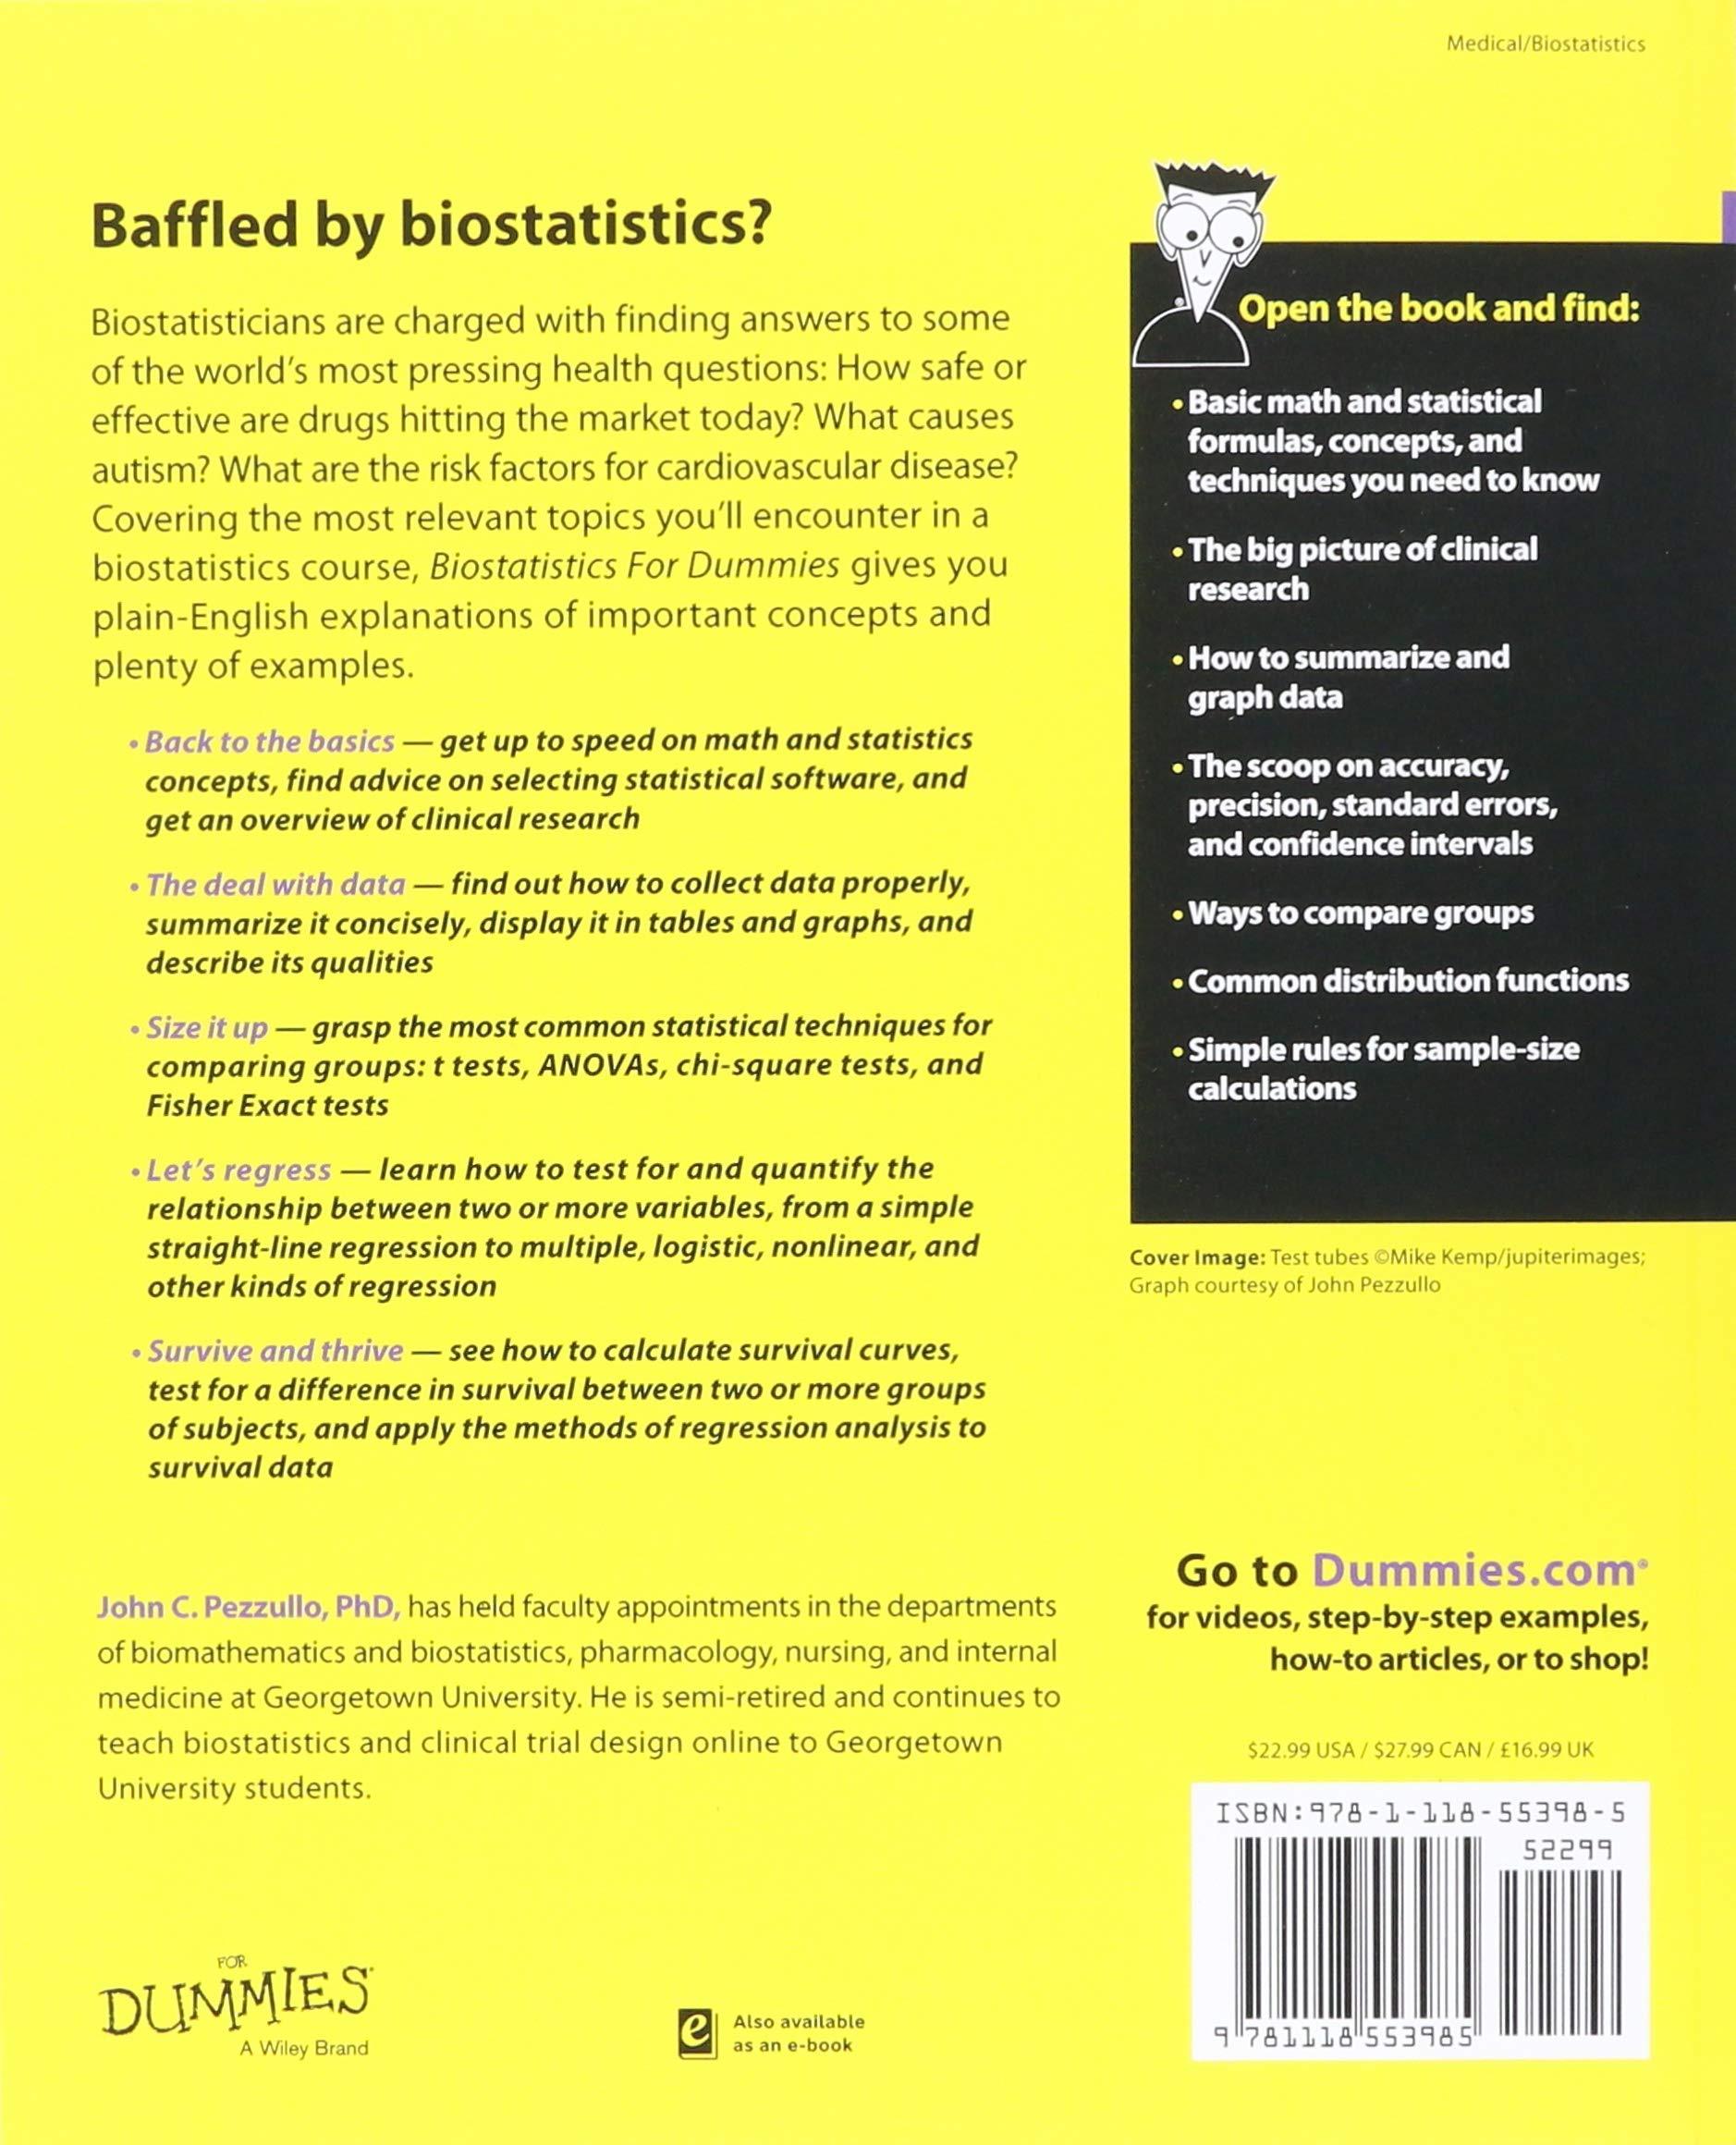 Biostatistics For Dummies: John Pezzullo: 9781118553985: Amazon com